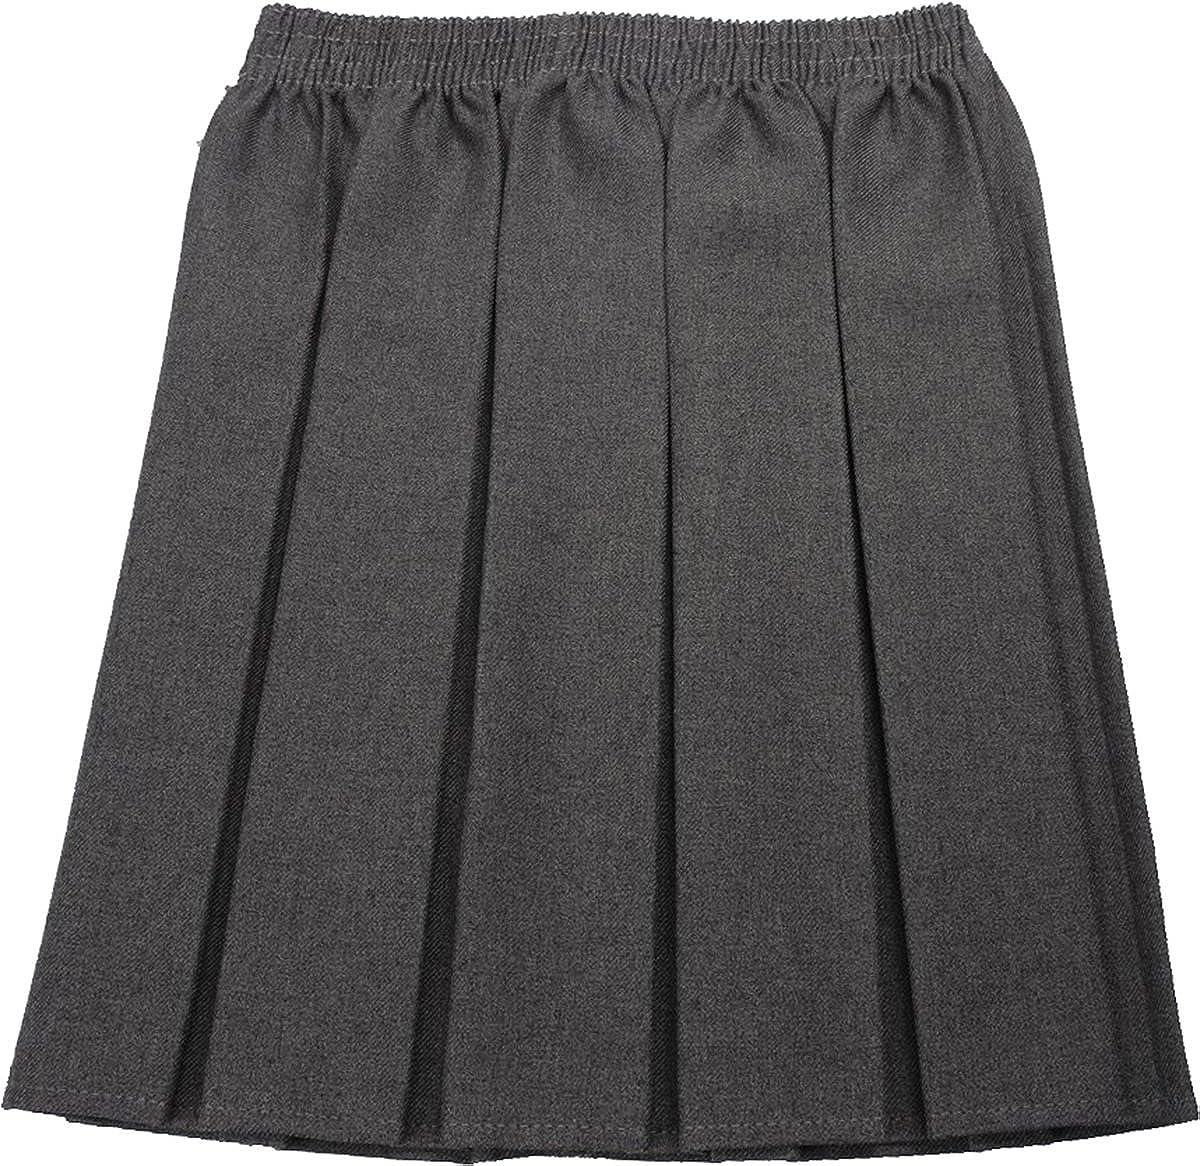 Schulrock M/ädchen Plissiert Uniform Gr/ö/ßen nur Uniform/® UK